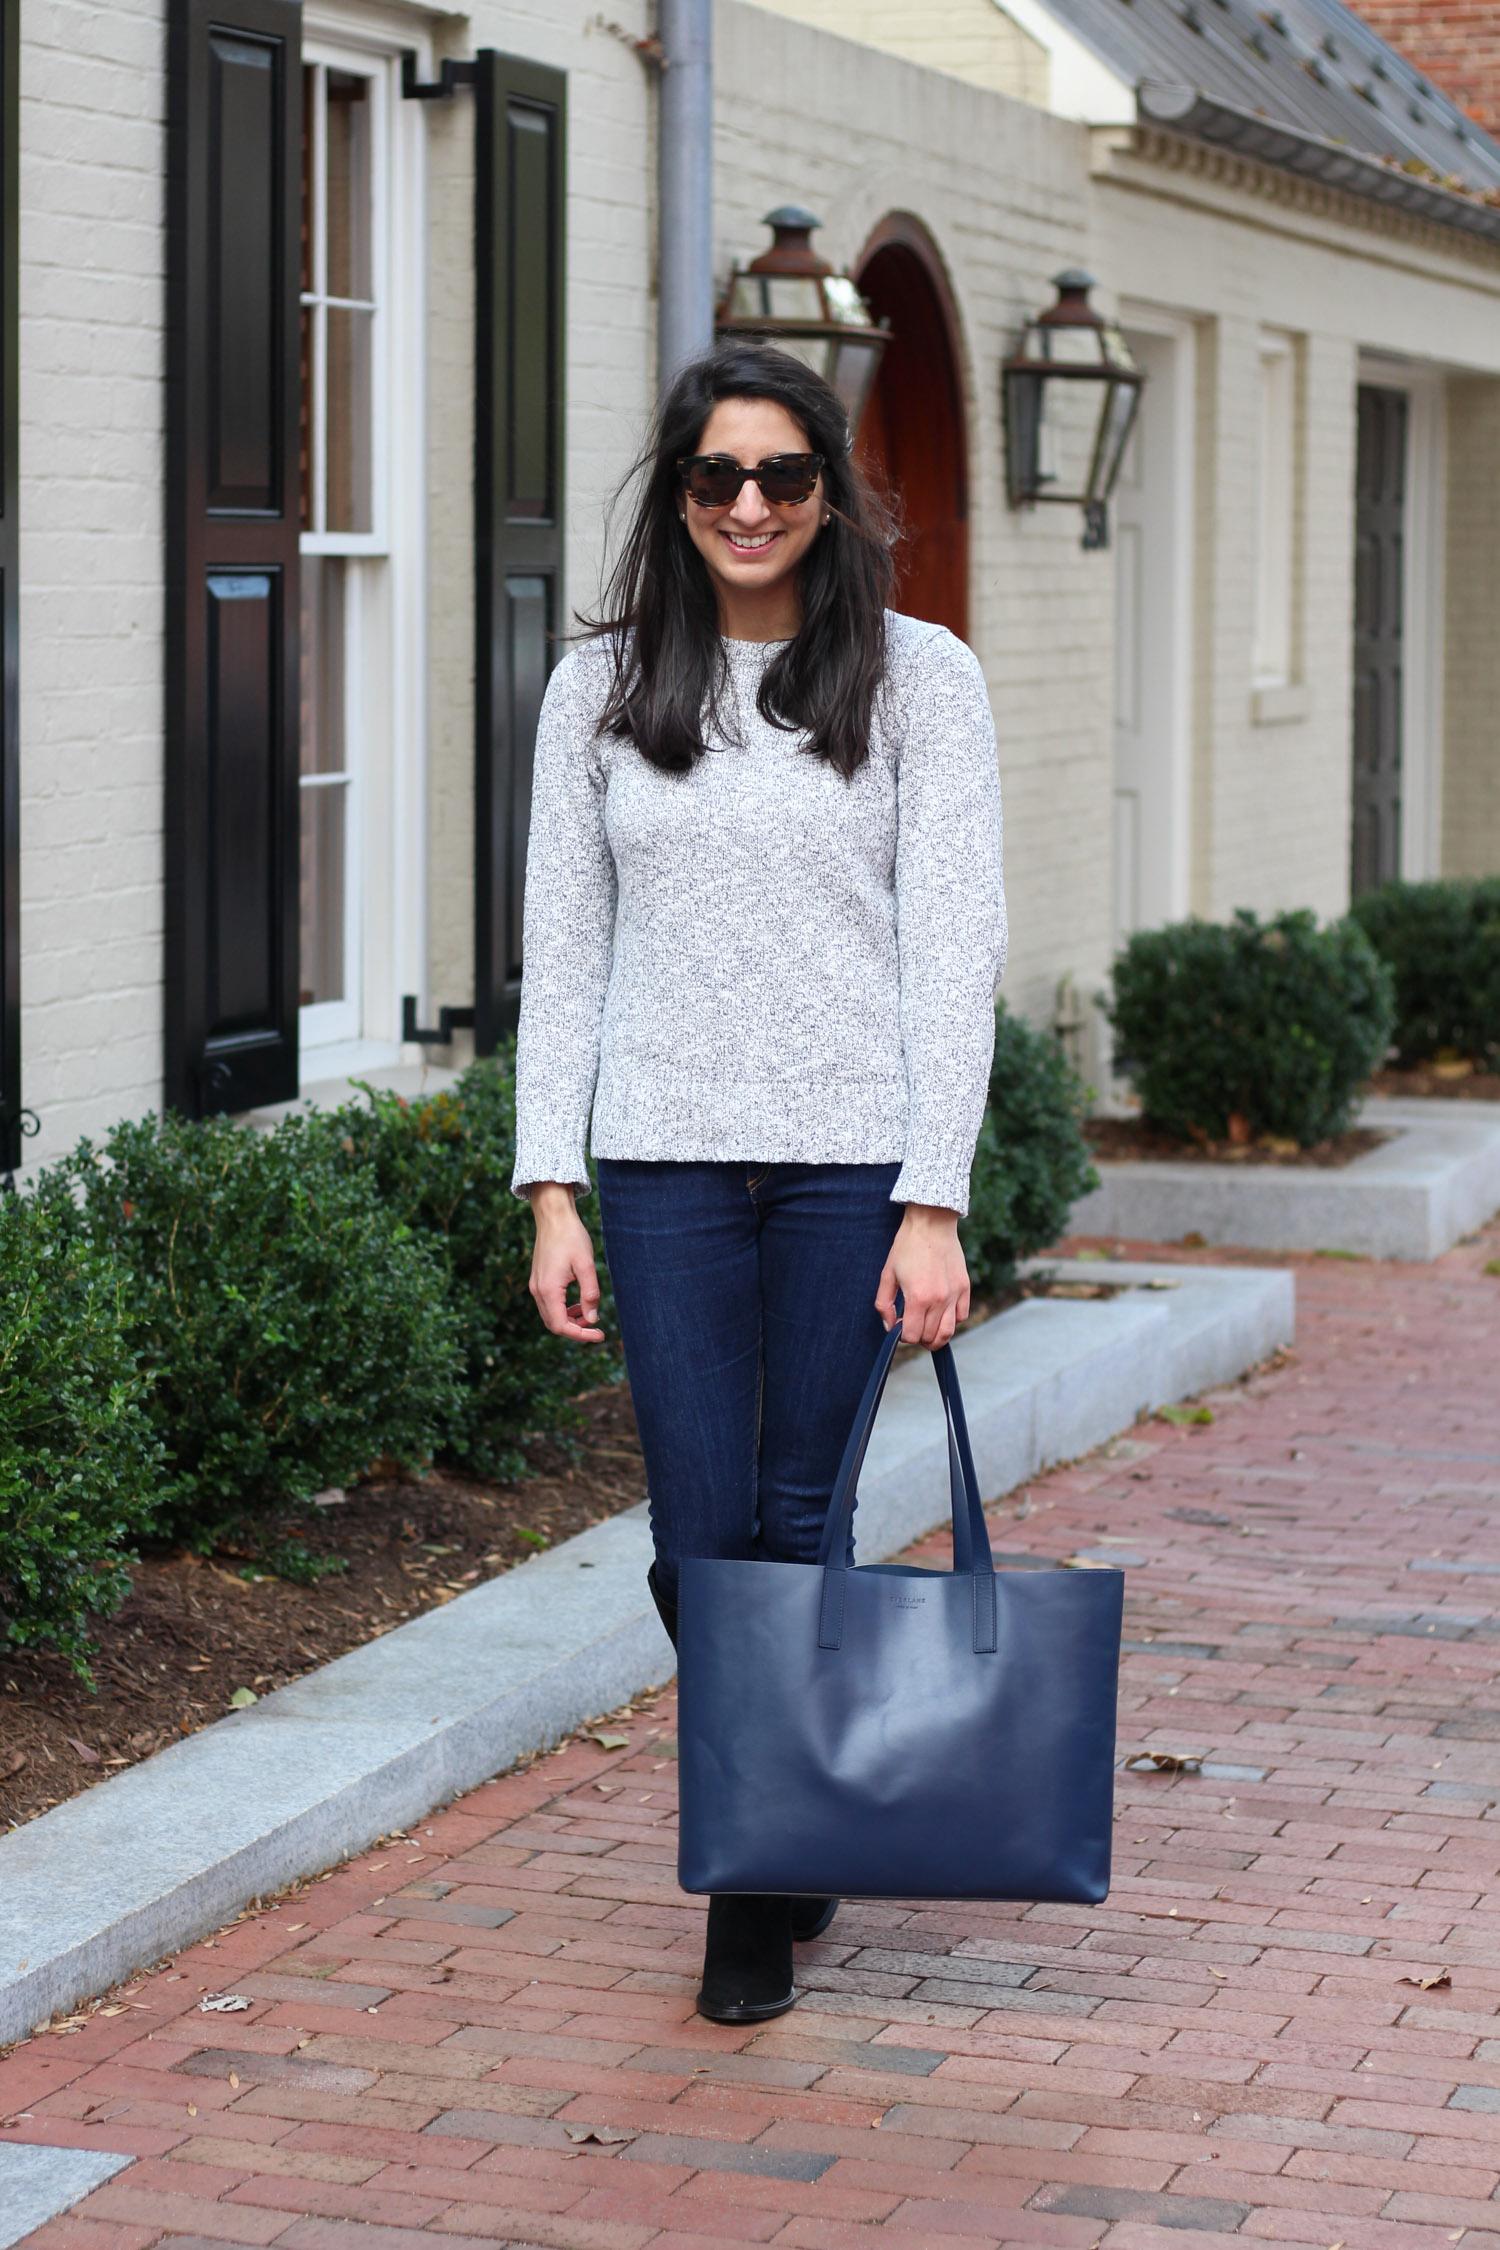 Aquatalia Giada Boots review featured by popular Washington DC style blogger, Monica Dutia